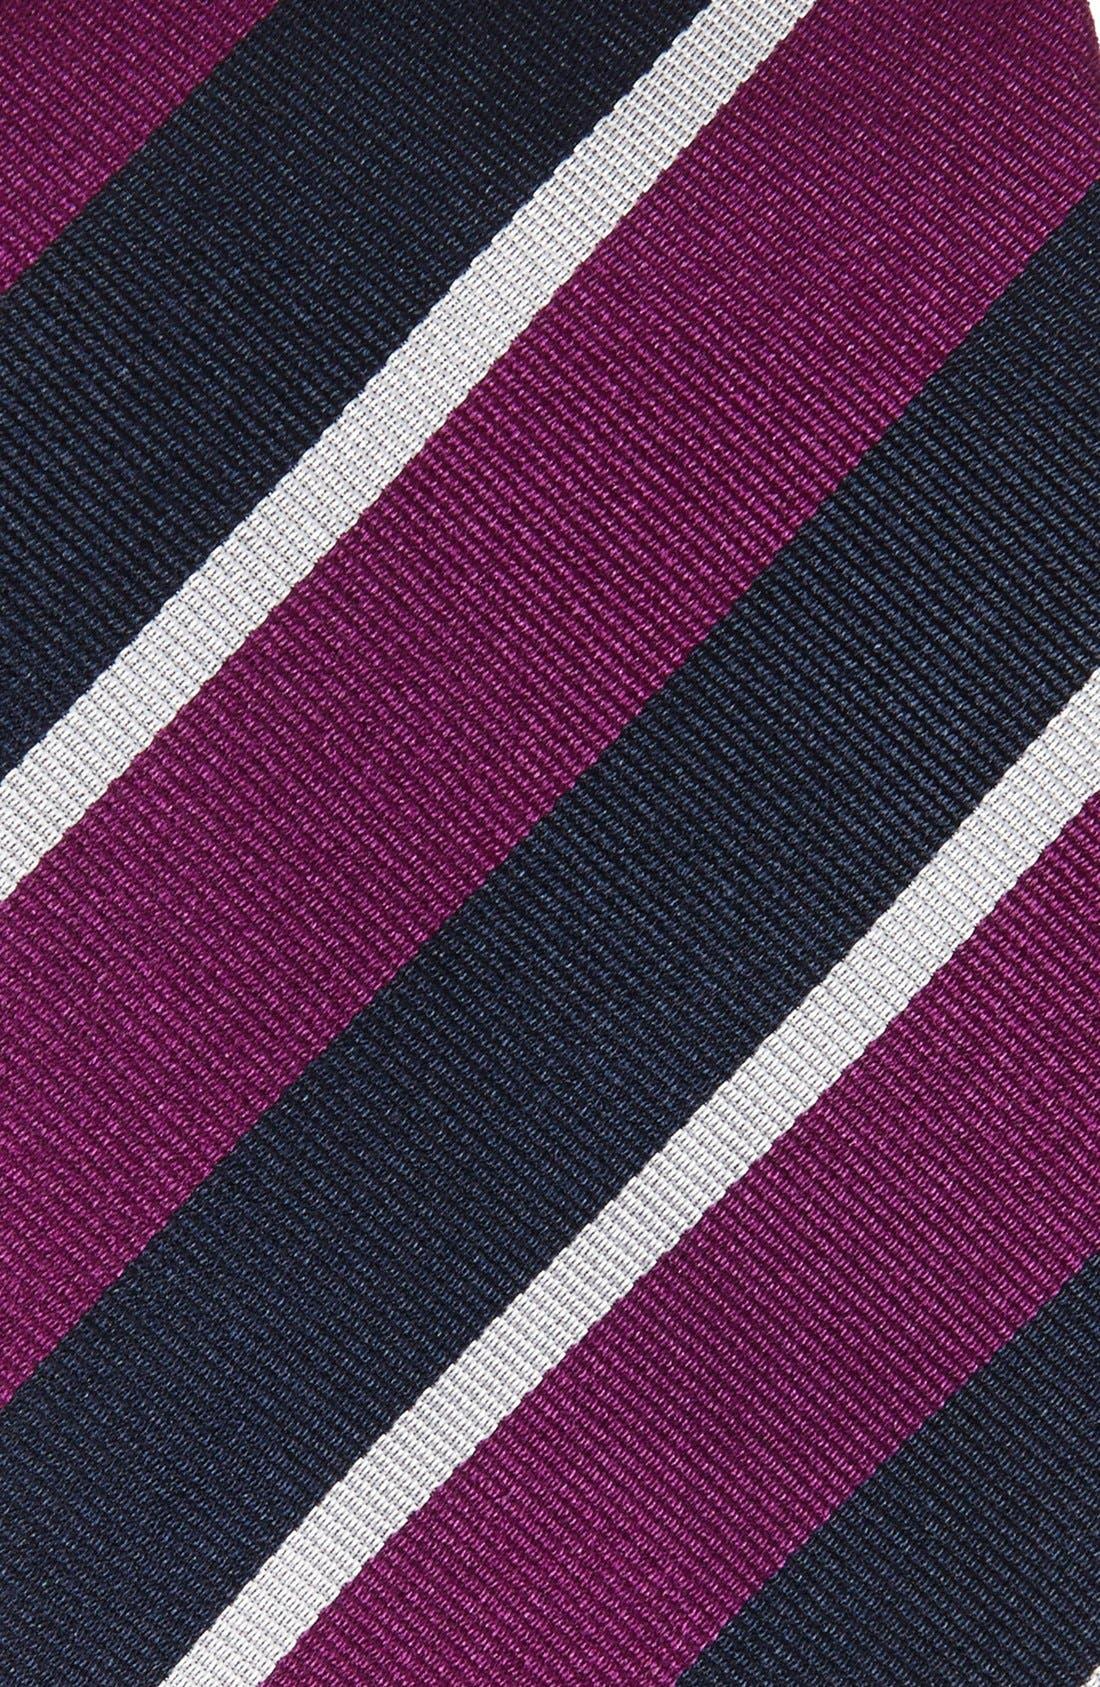 Stripe Silk Tie,                             Alternate thumbnail 2, color,                             PURPLE